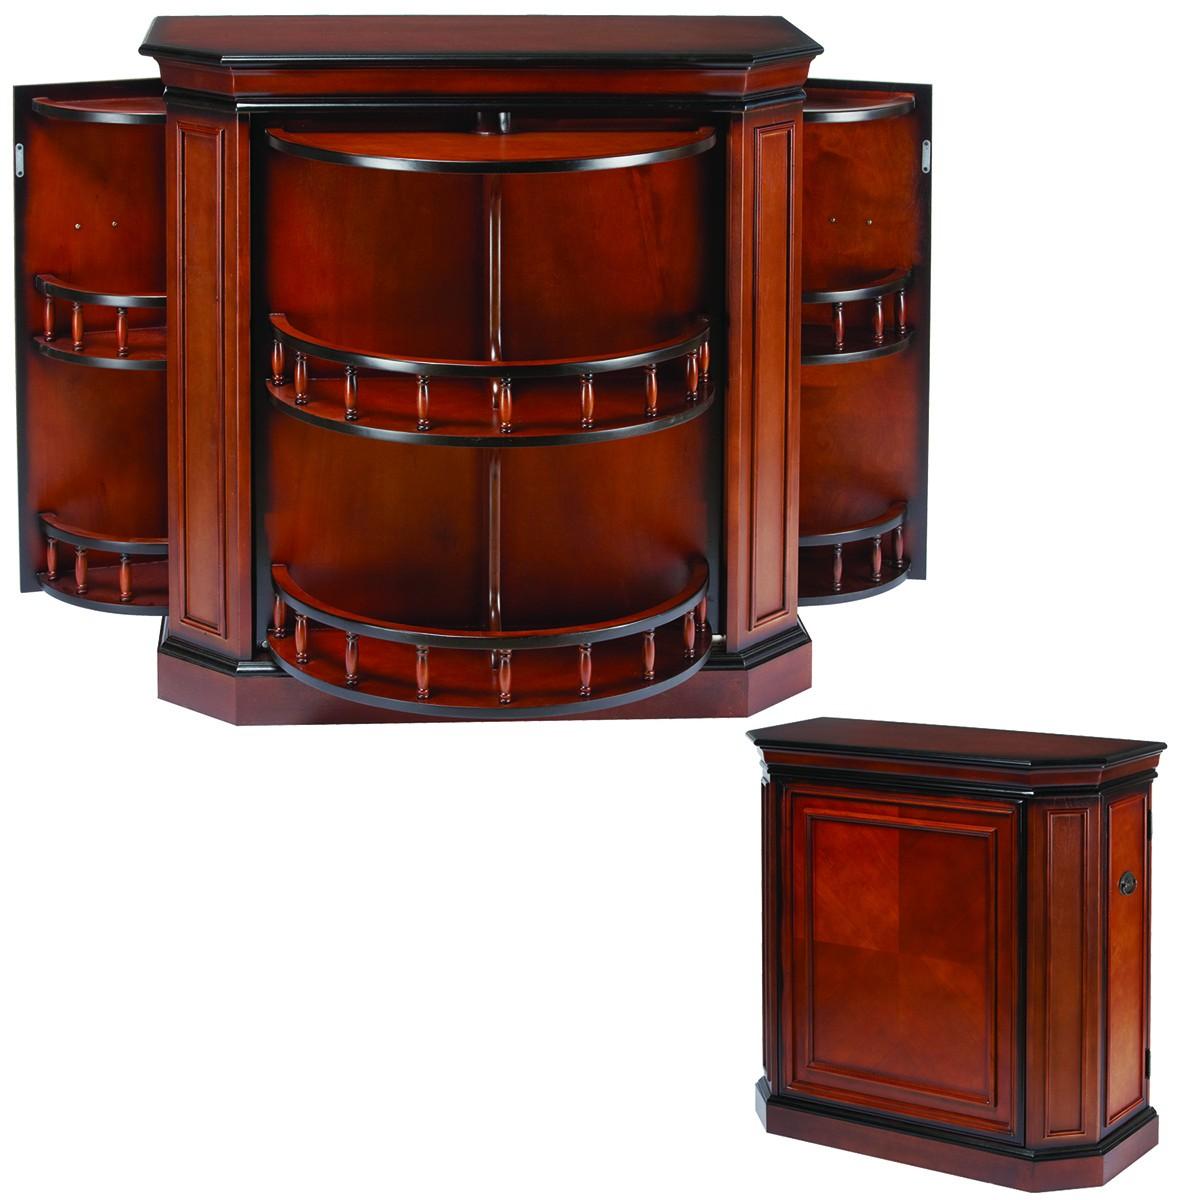 Bar Cabinet avec broche - Chestnut